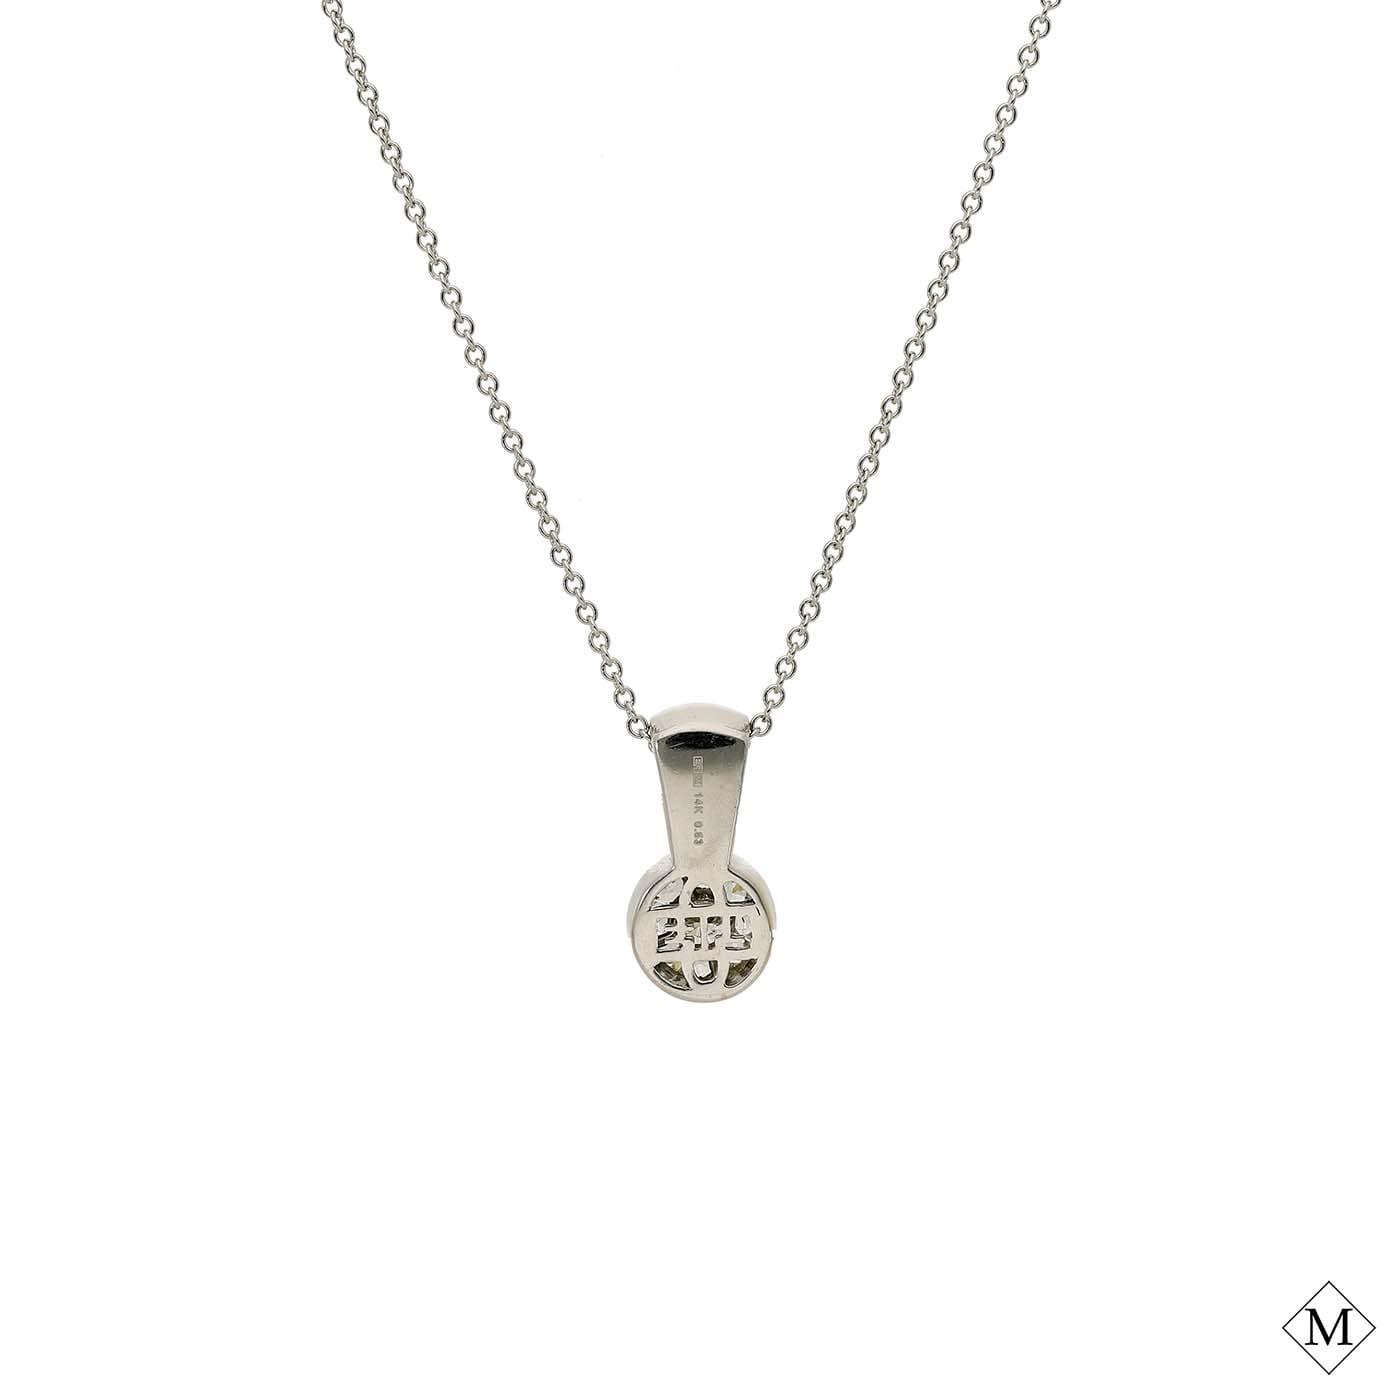 Classic Diamond PendantStyle #: MDPND9996